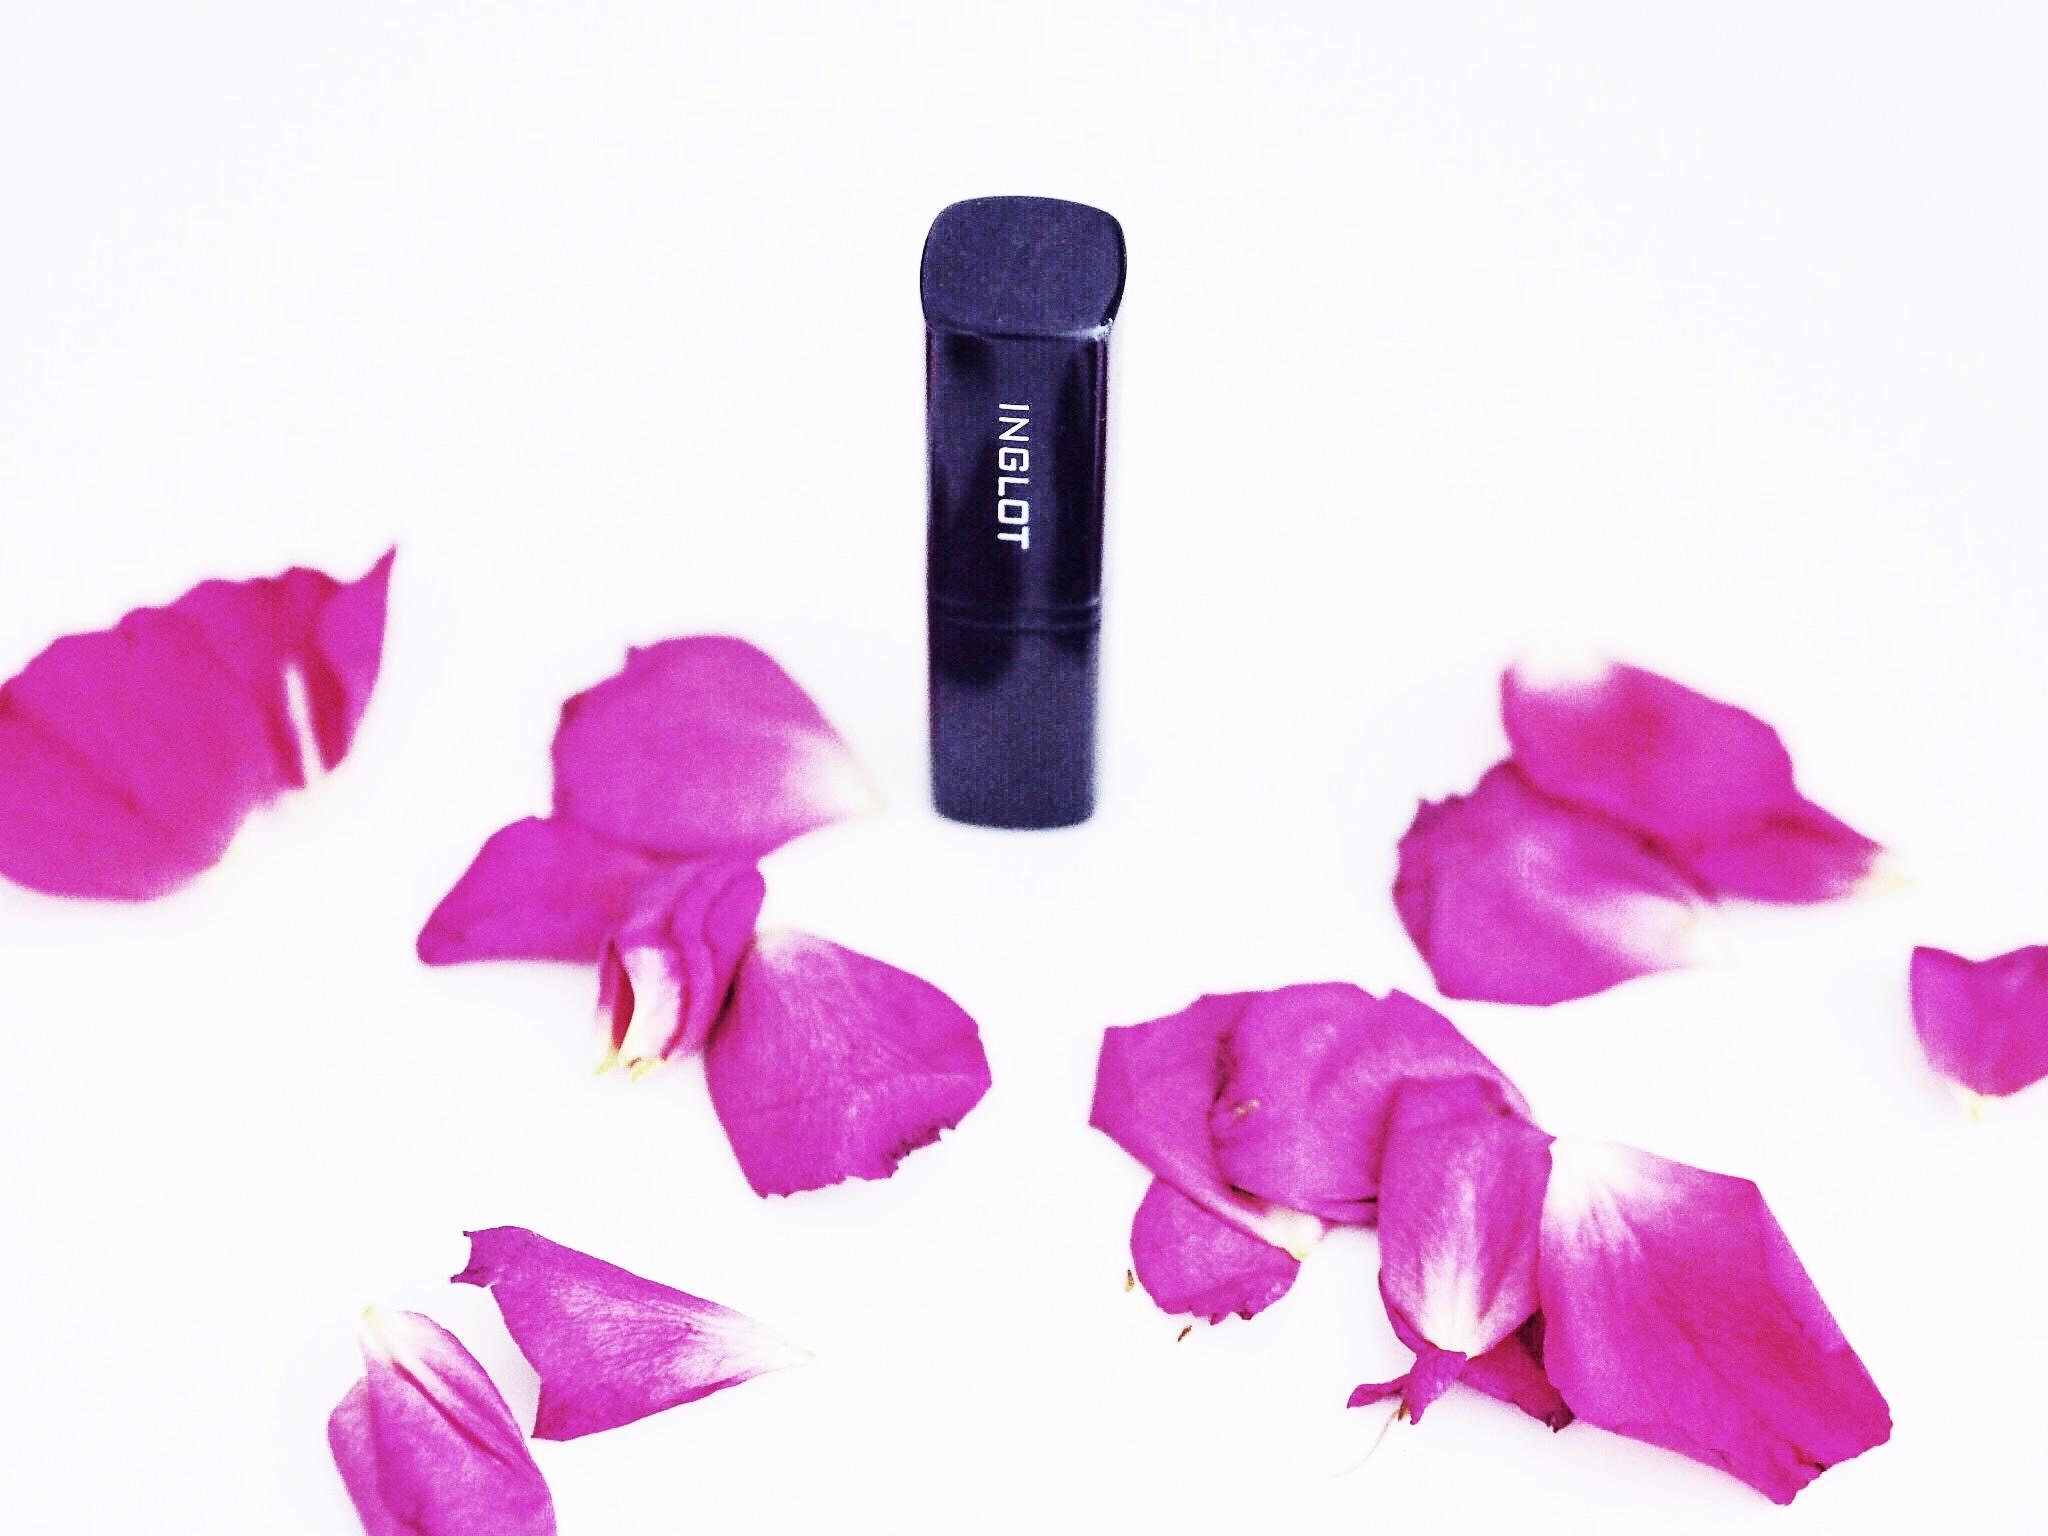 Inglot lipstick